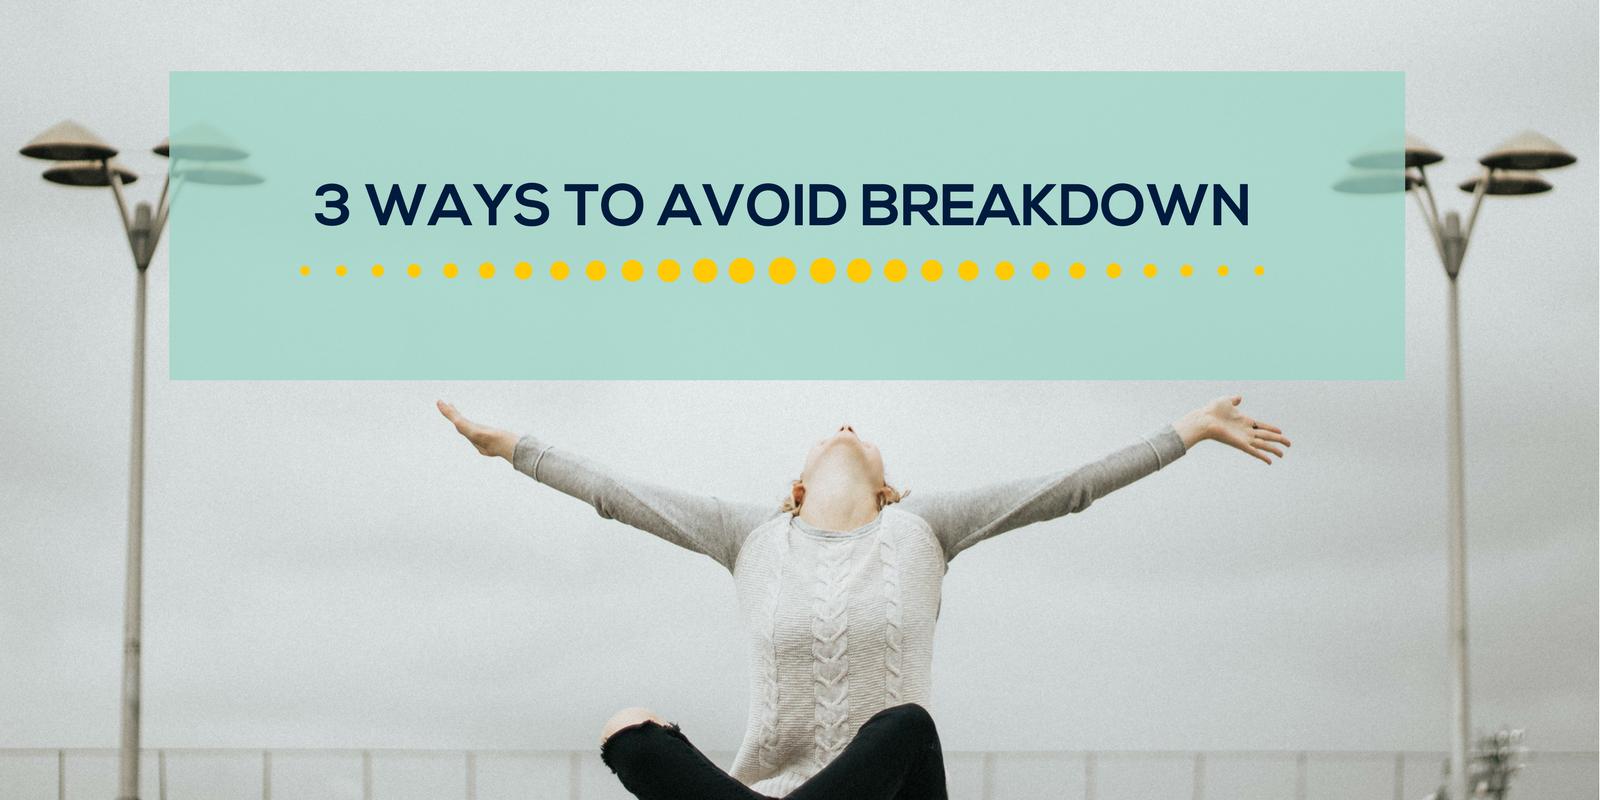 3 Ways to Avoid Breakdwon.png